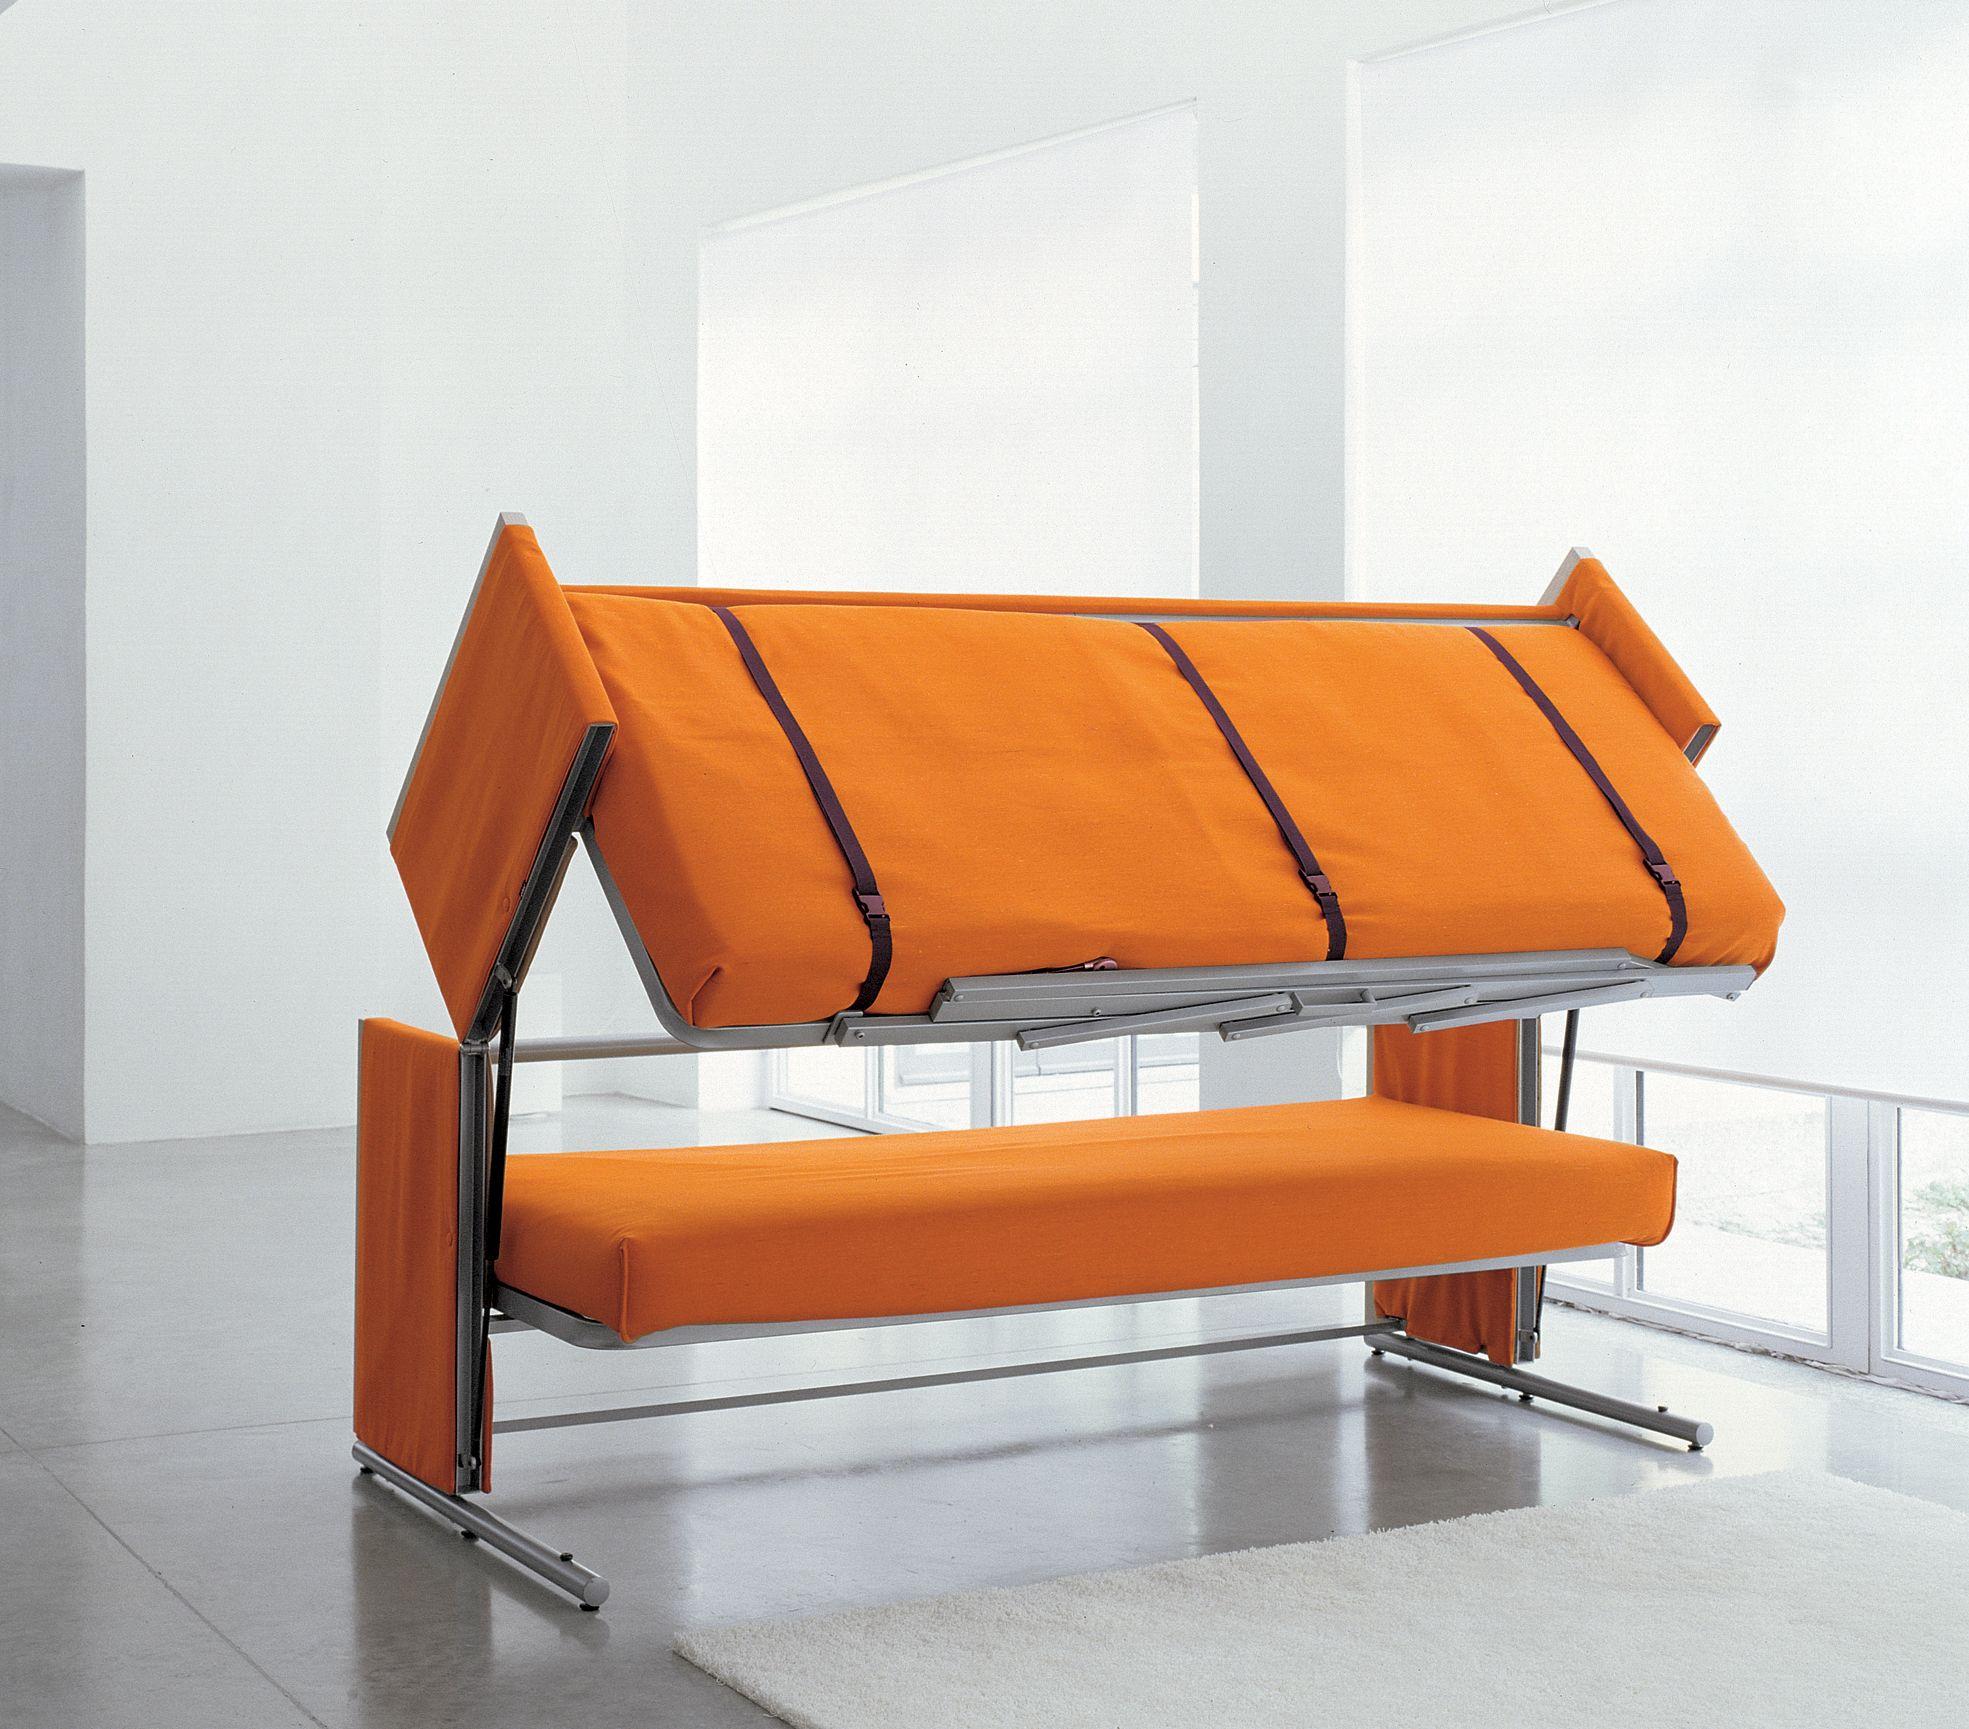 Doc Sofa Bunk Bed Small room layouts, Sofa design